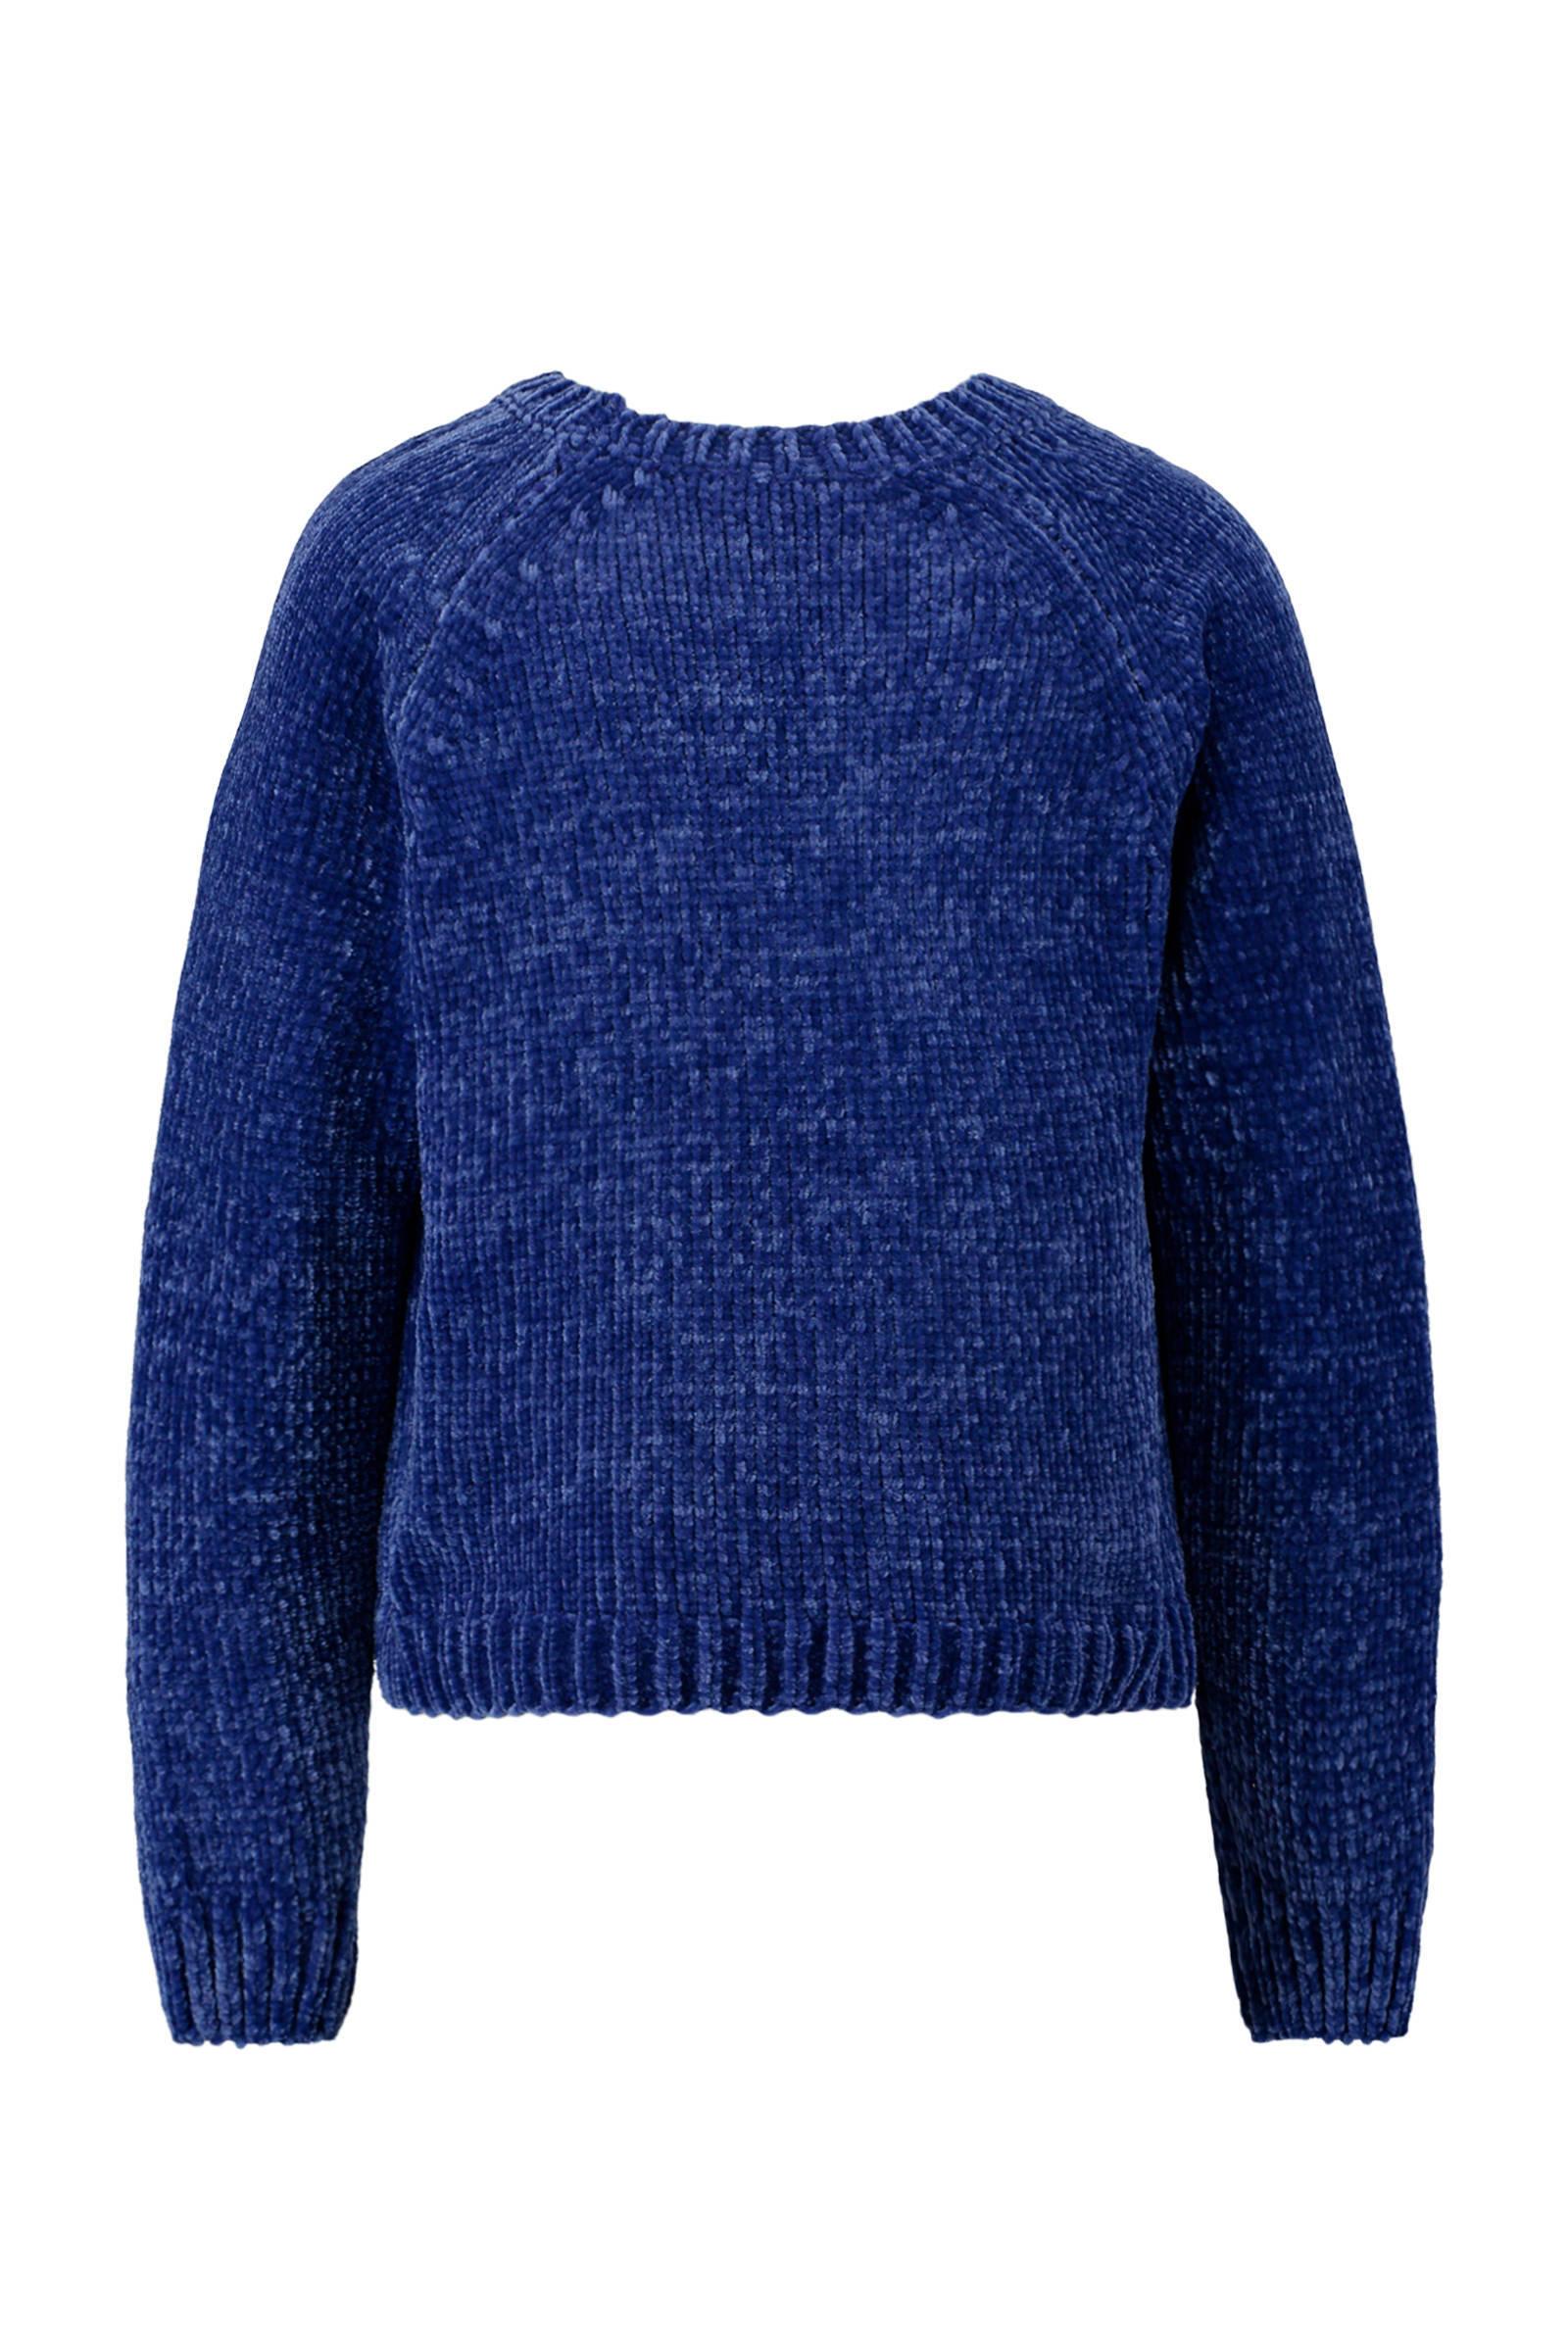 CoolCat chenille trui donkerblauw | wehkamp